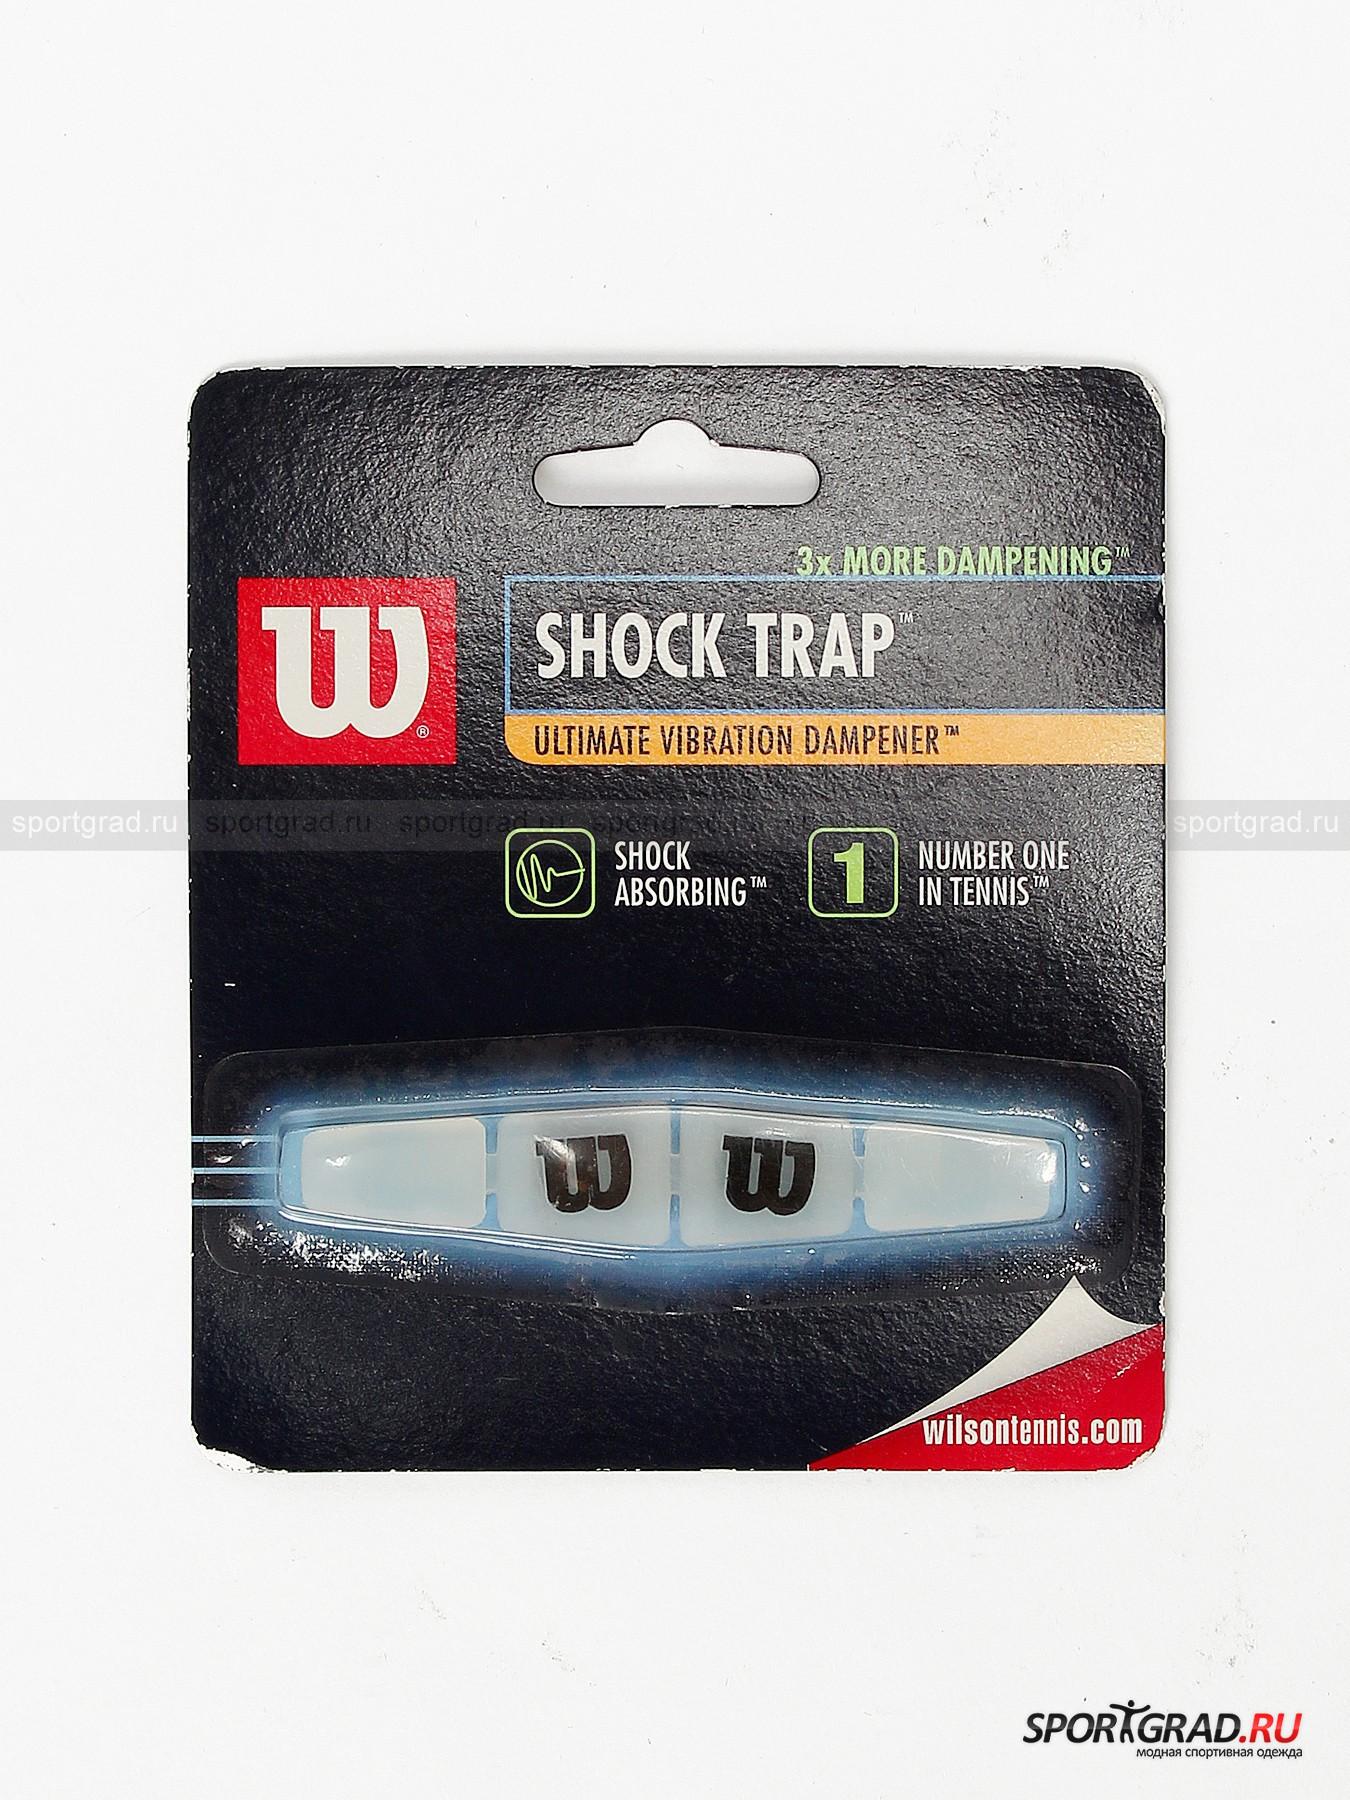 Виброгаситель Shok Trap WILSON от Спортград